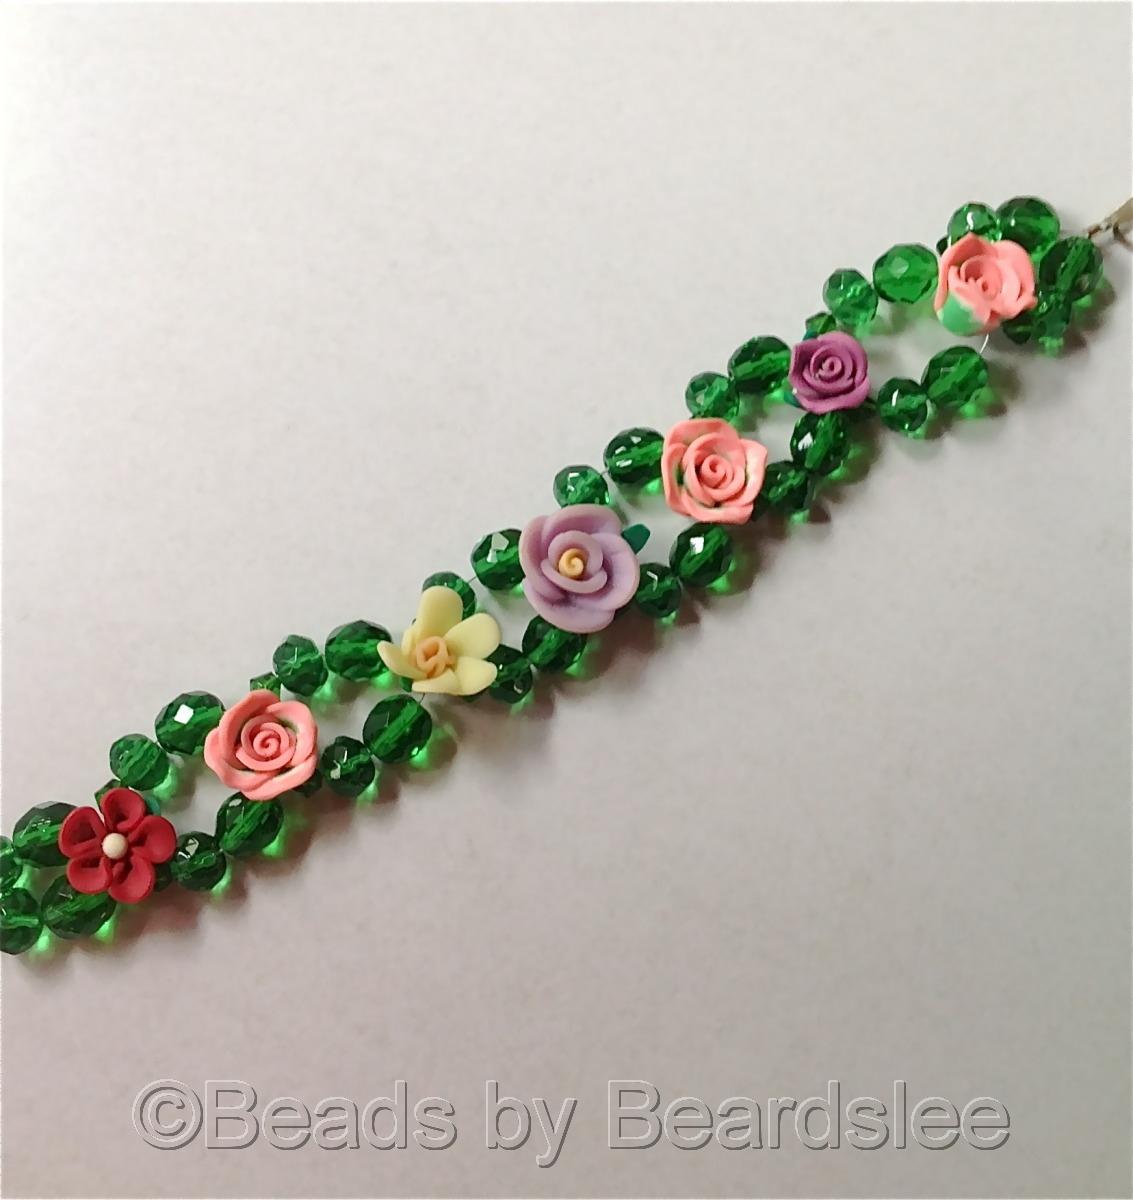 Woven Flower Bracelet (large view)